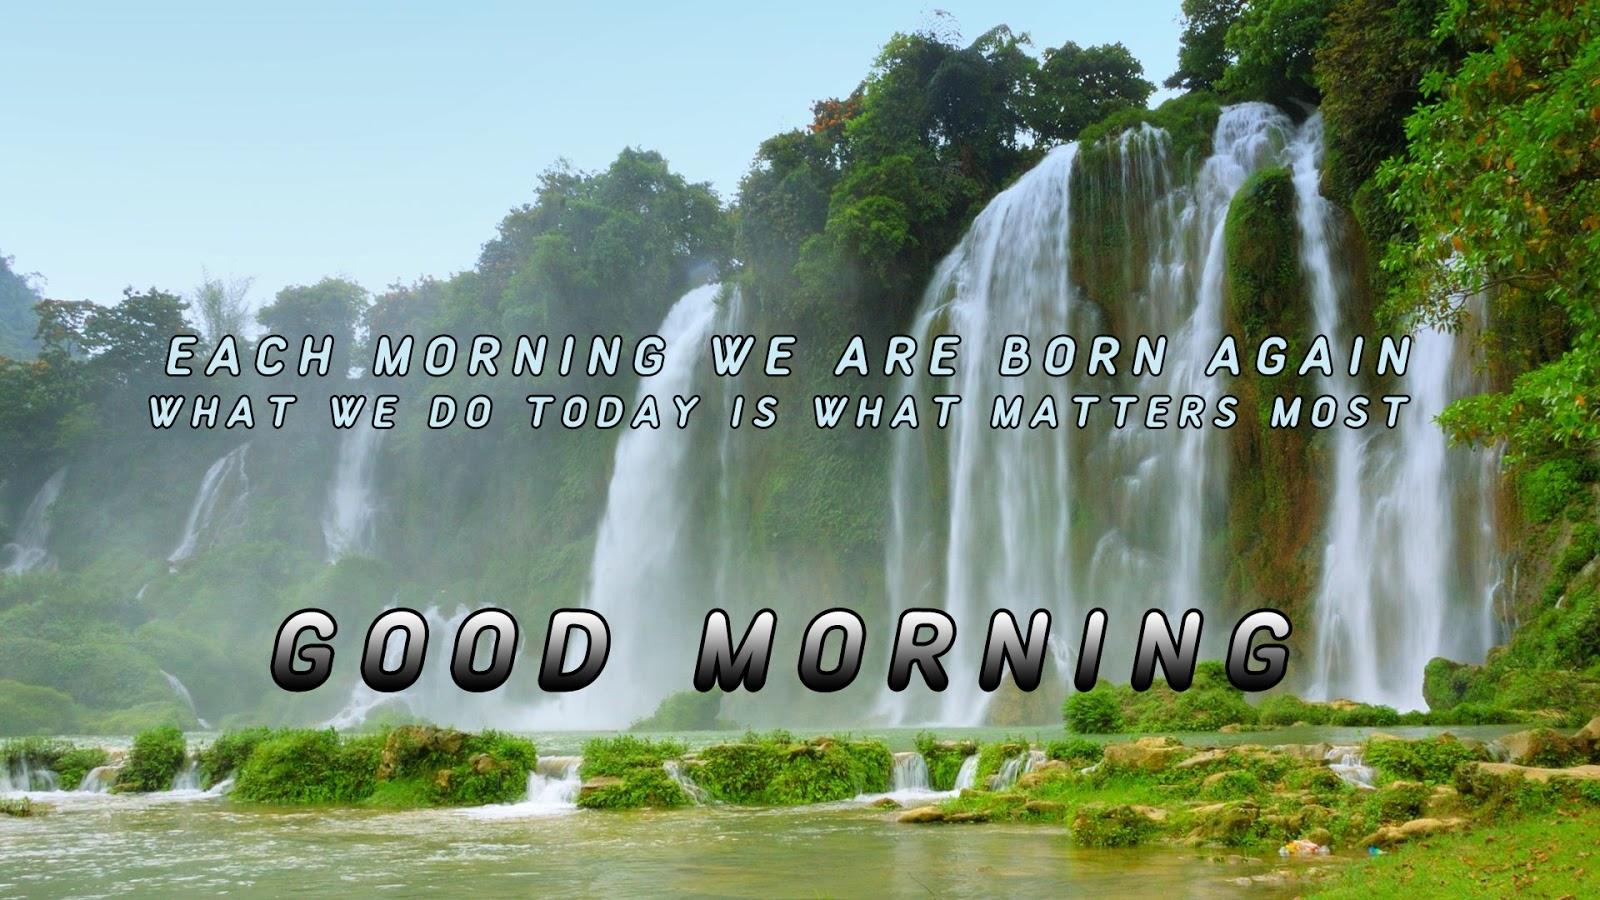 waterfall nature good morning image